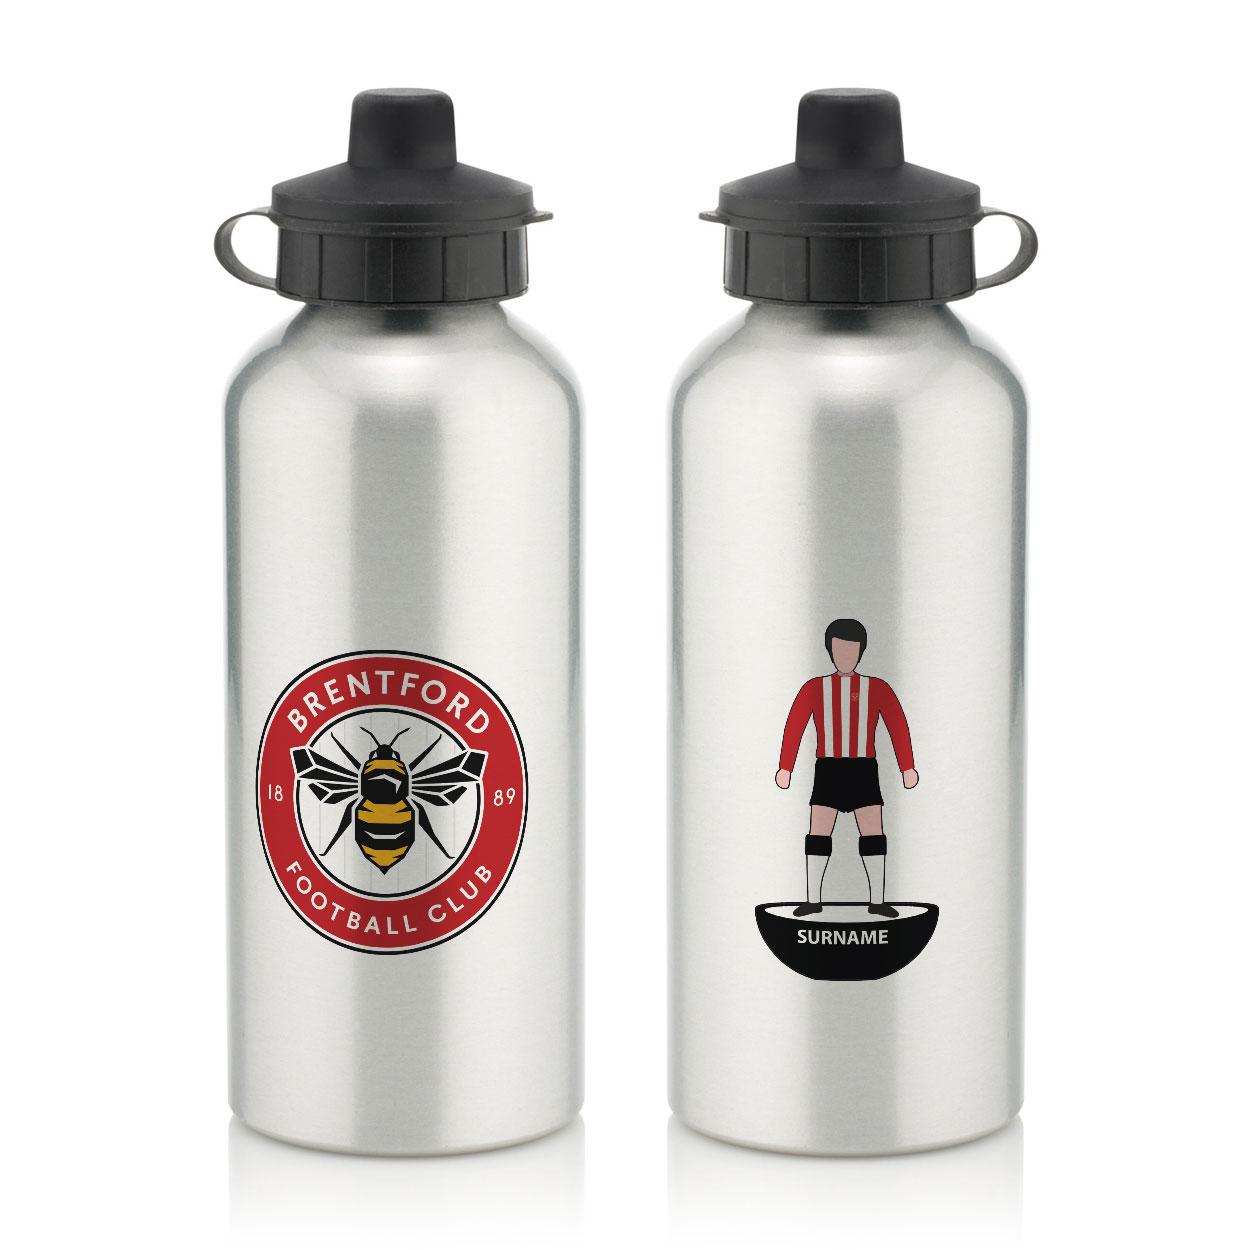 Brentford Player Figure Water Bottle